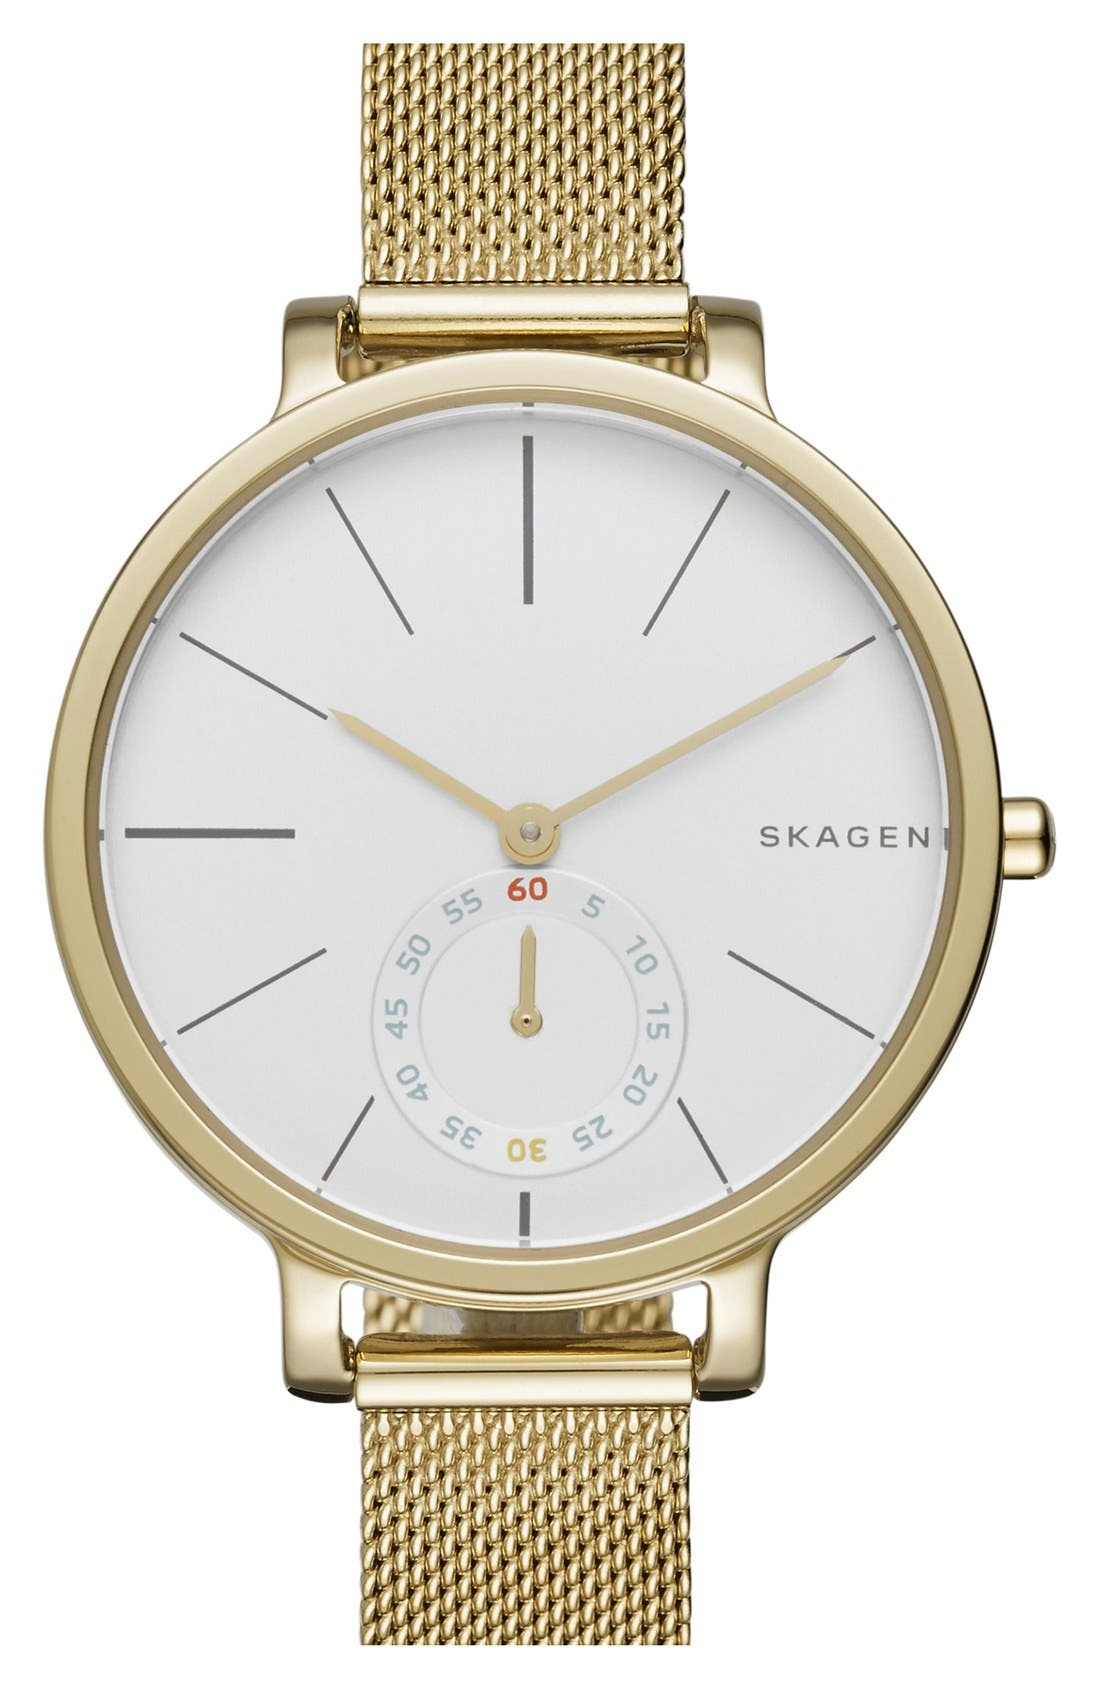 Main Image - Skagen 'Hagen' Mesh Strap Watch, 34mm